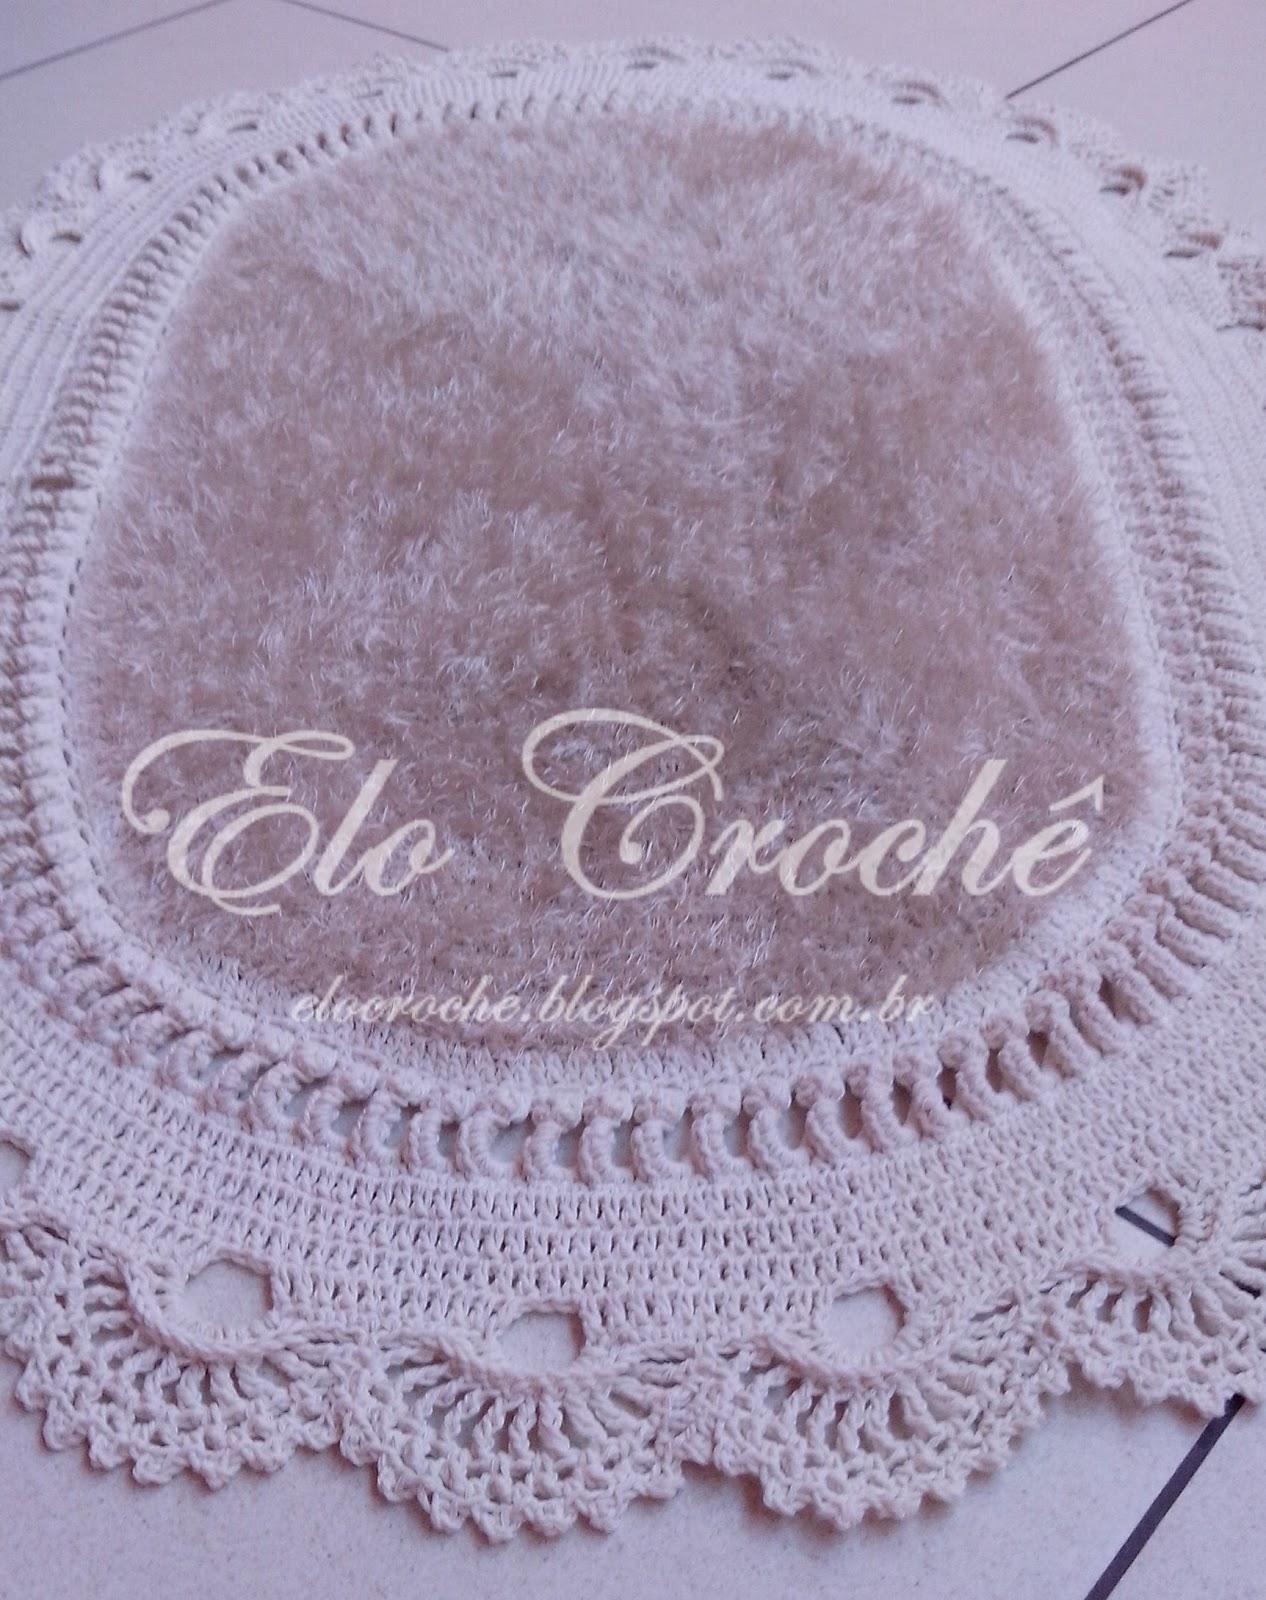 Crochê by Eloiza Castro: TAPETE PARA QUARTO DE CROCHÊ MAXI LUXO #3F2C45 1266 1600